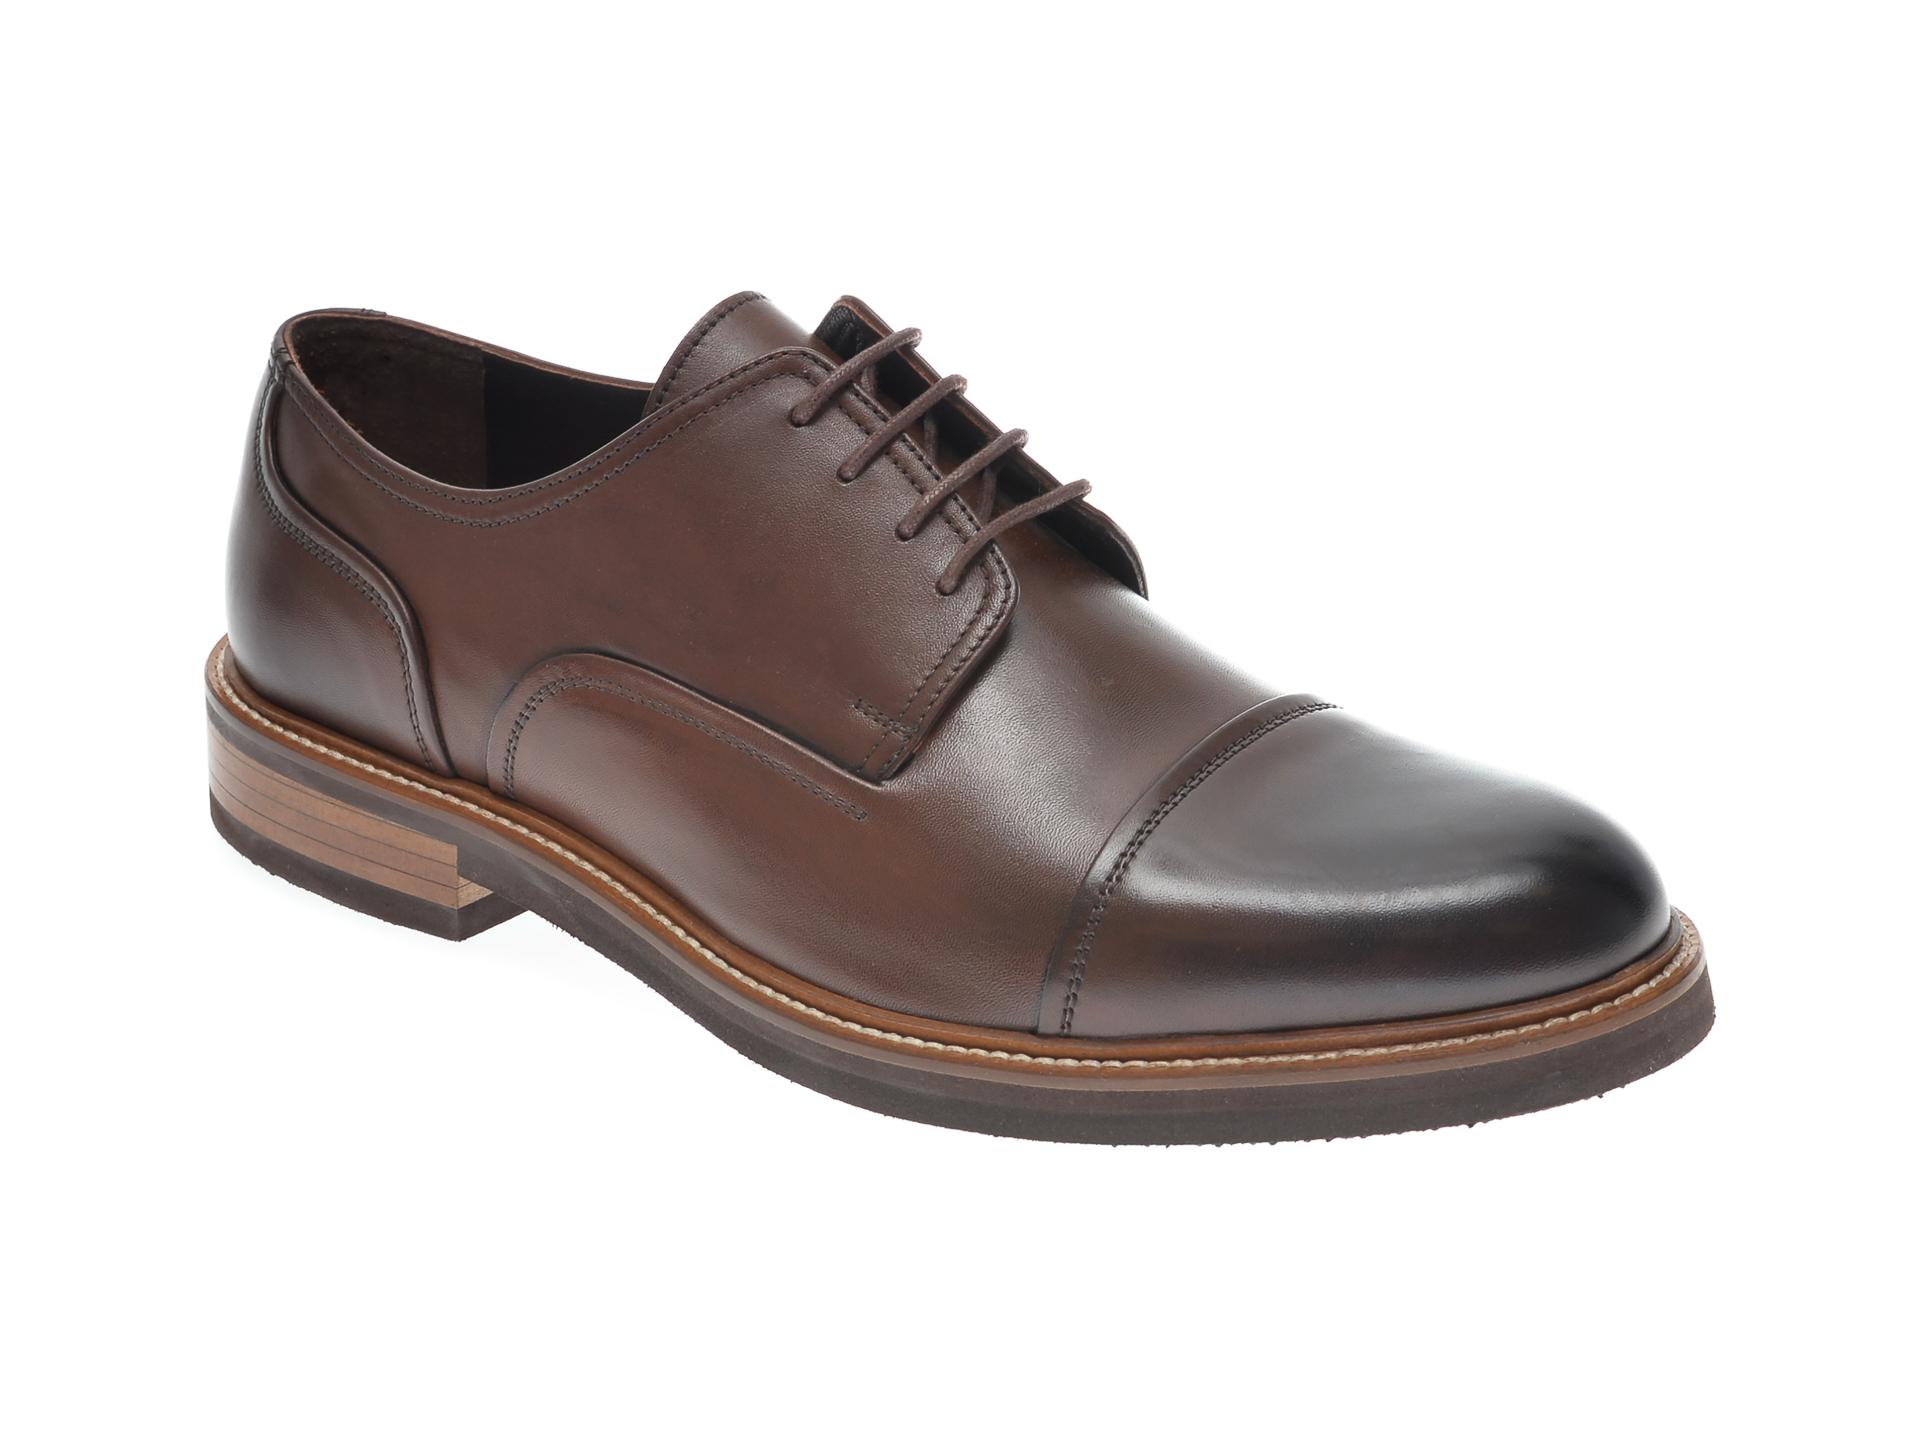 Pantofi OTTER maro, 7843, din piele naturala imagine